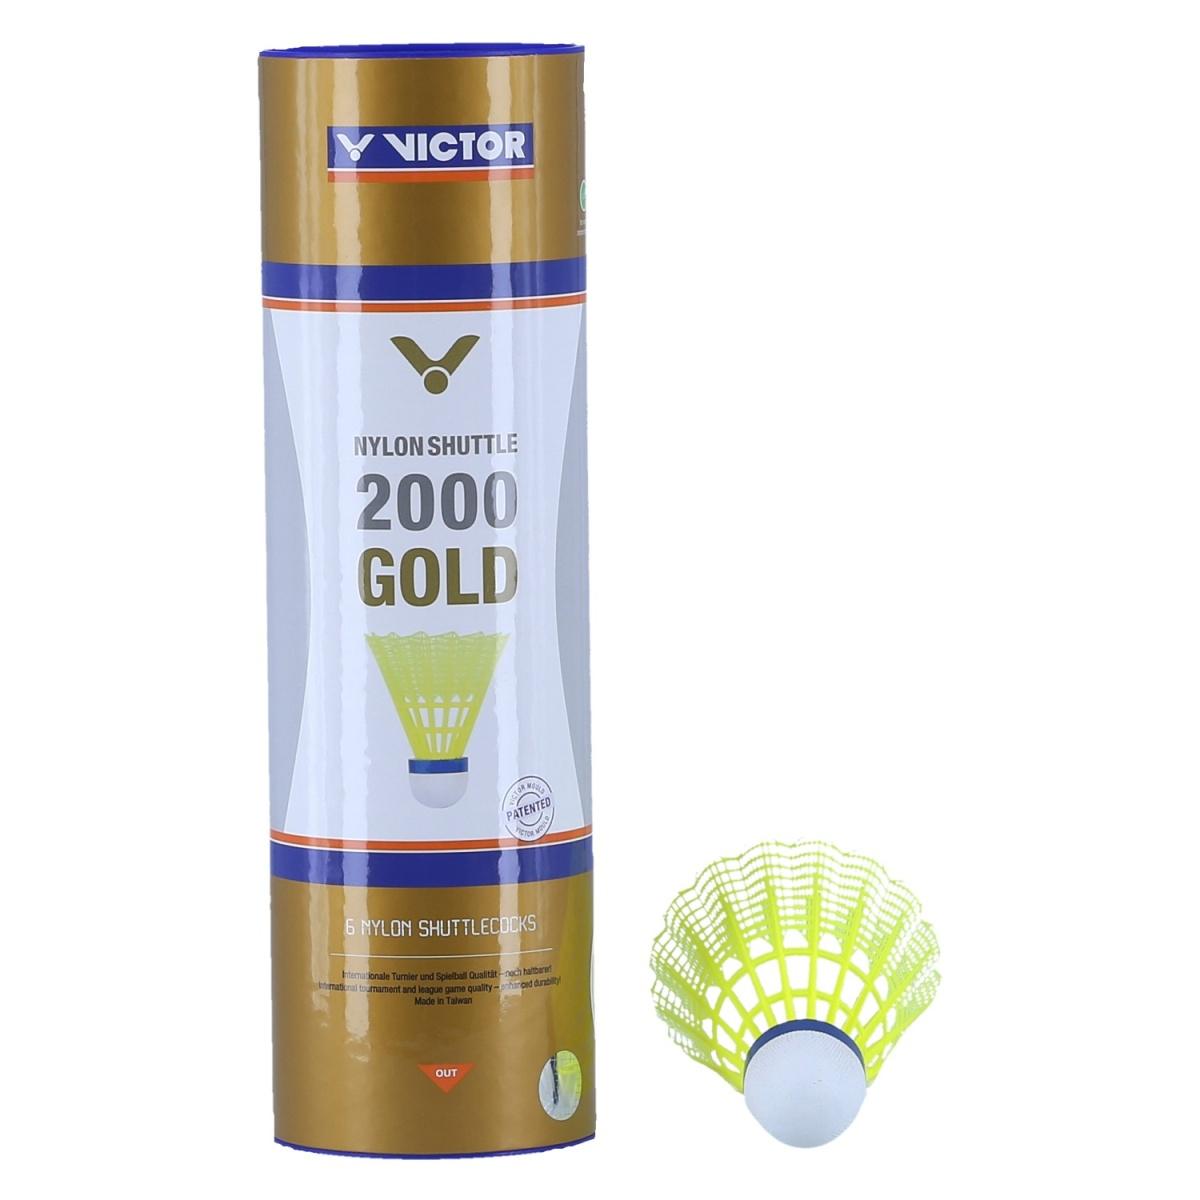 VICTOR Badmintonball Nylonshuttle 2000 schnell 6er Dose weiß Plastik Federball Bälle